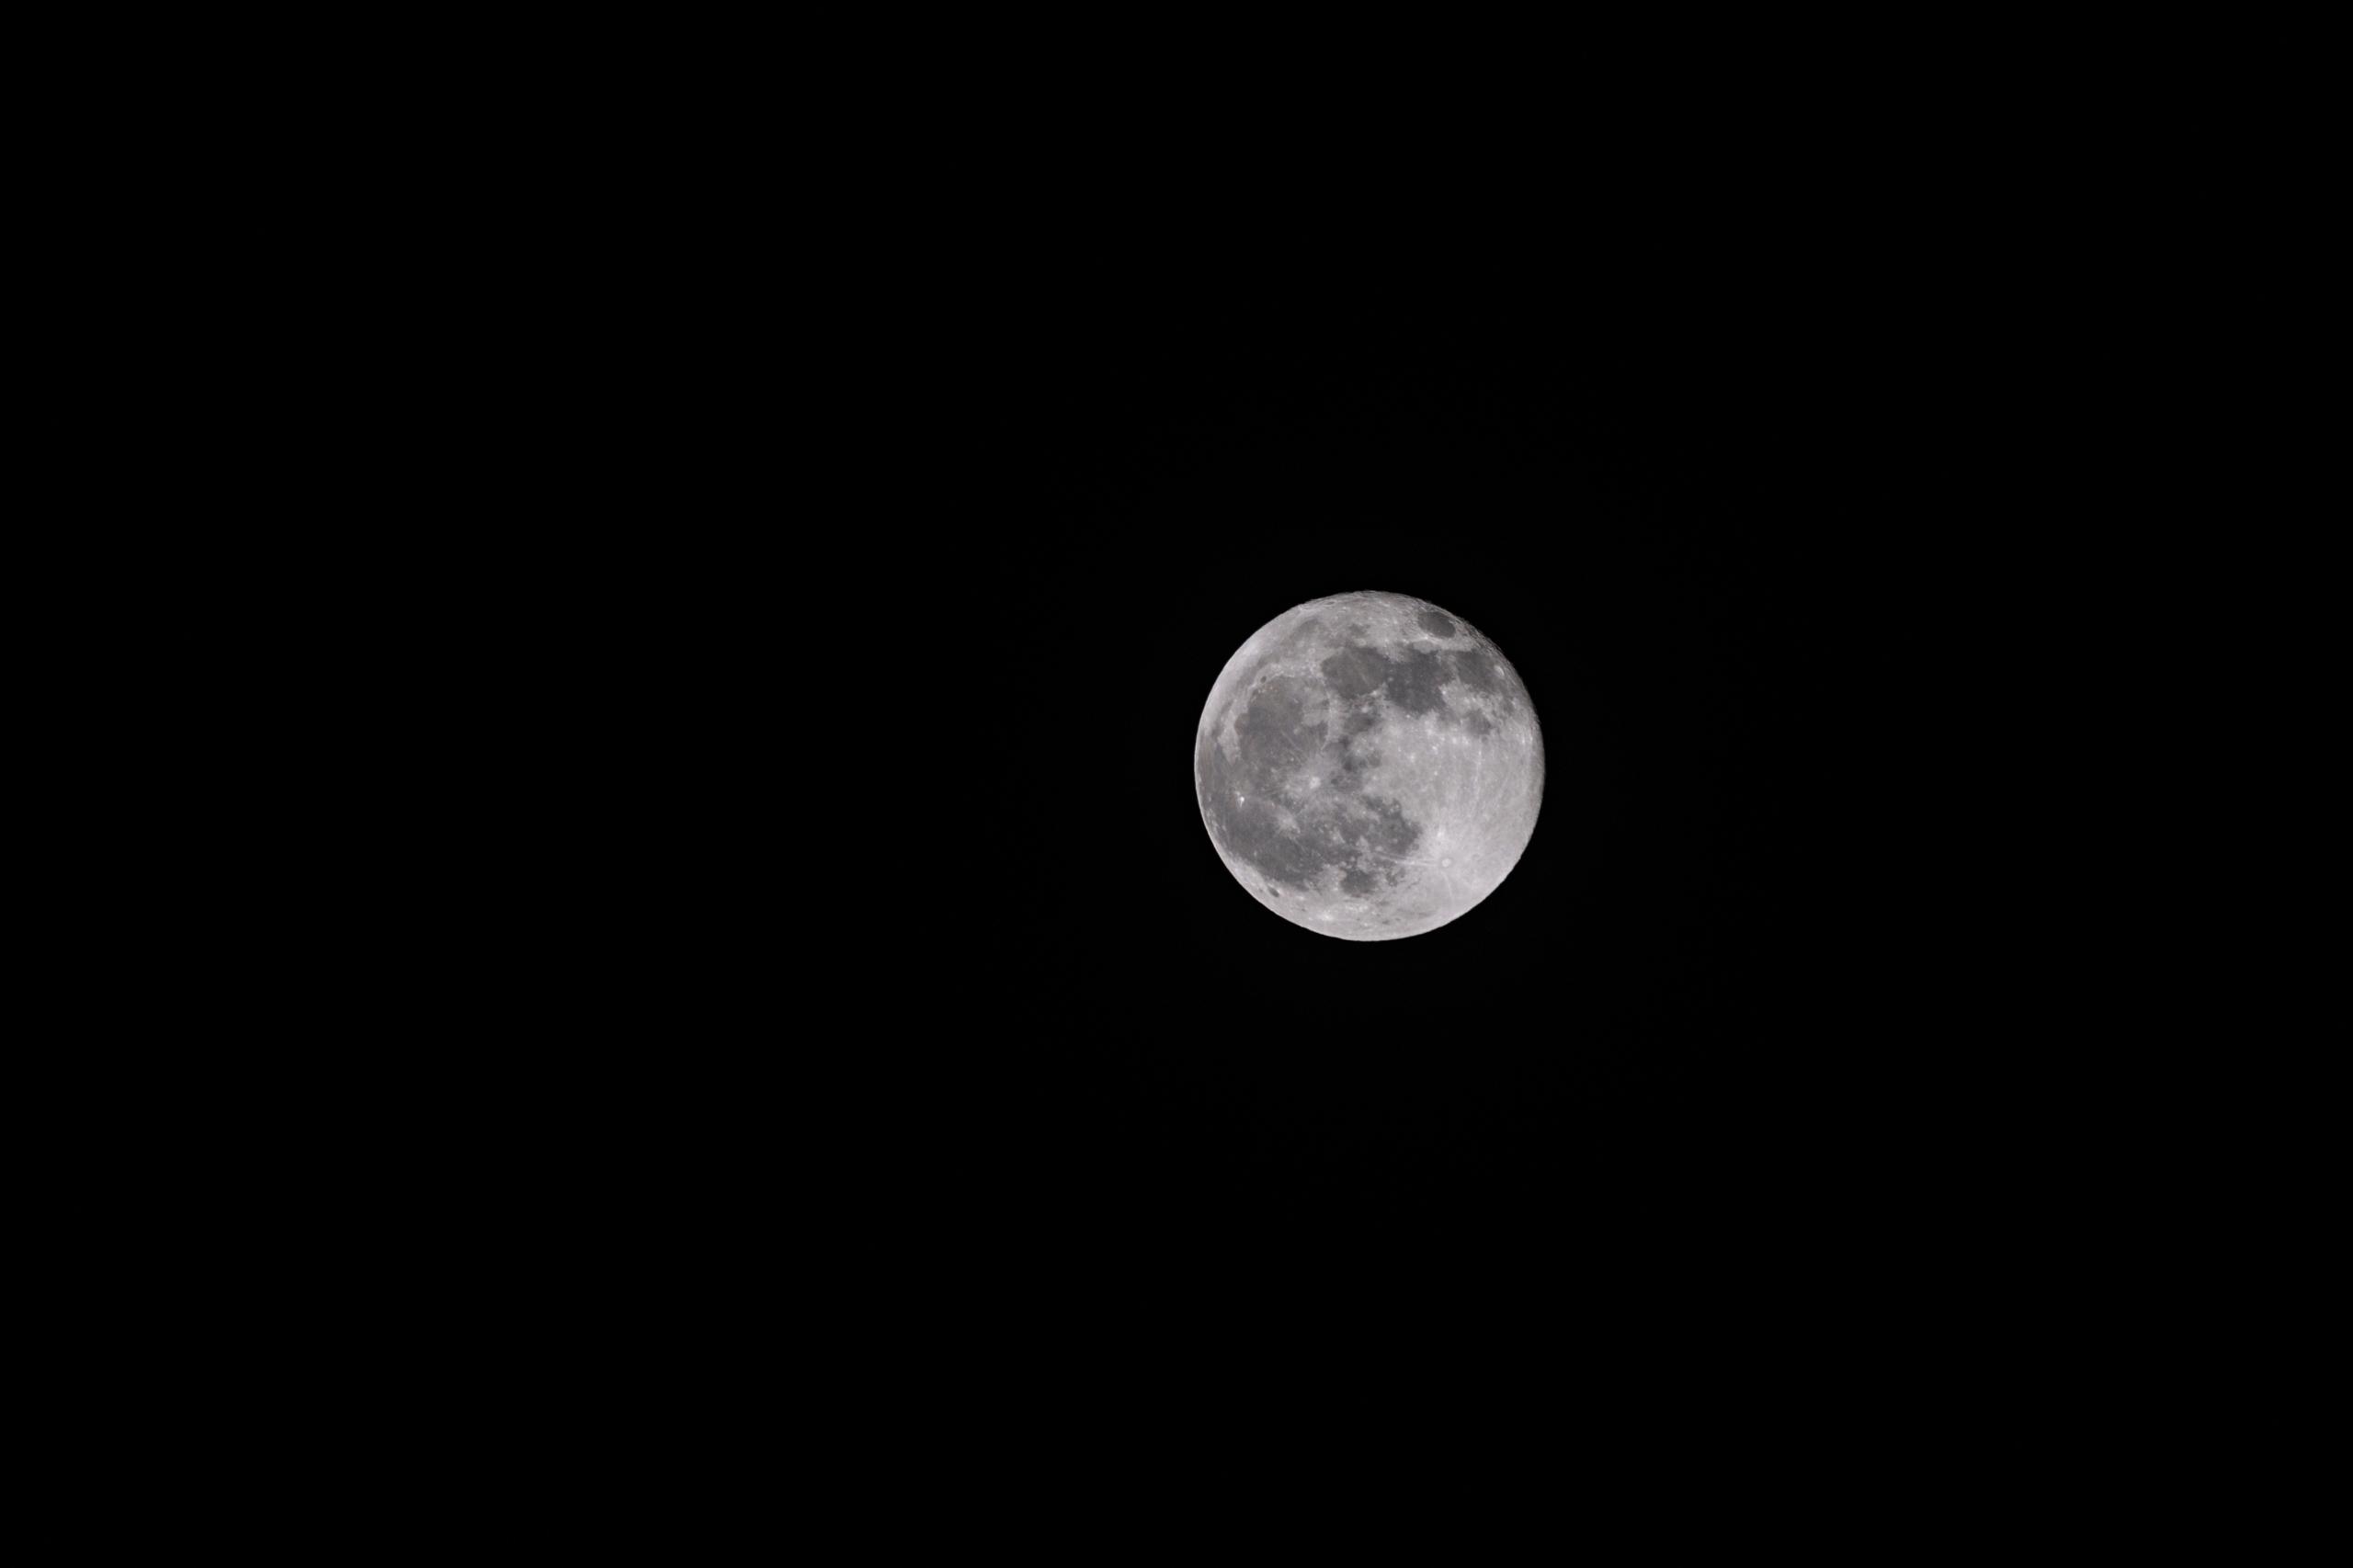 Moon 2020 11 30 08 Stansberry L - davidseibold | ello